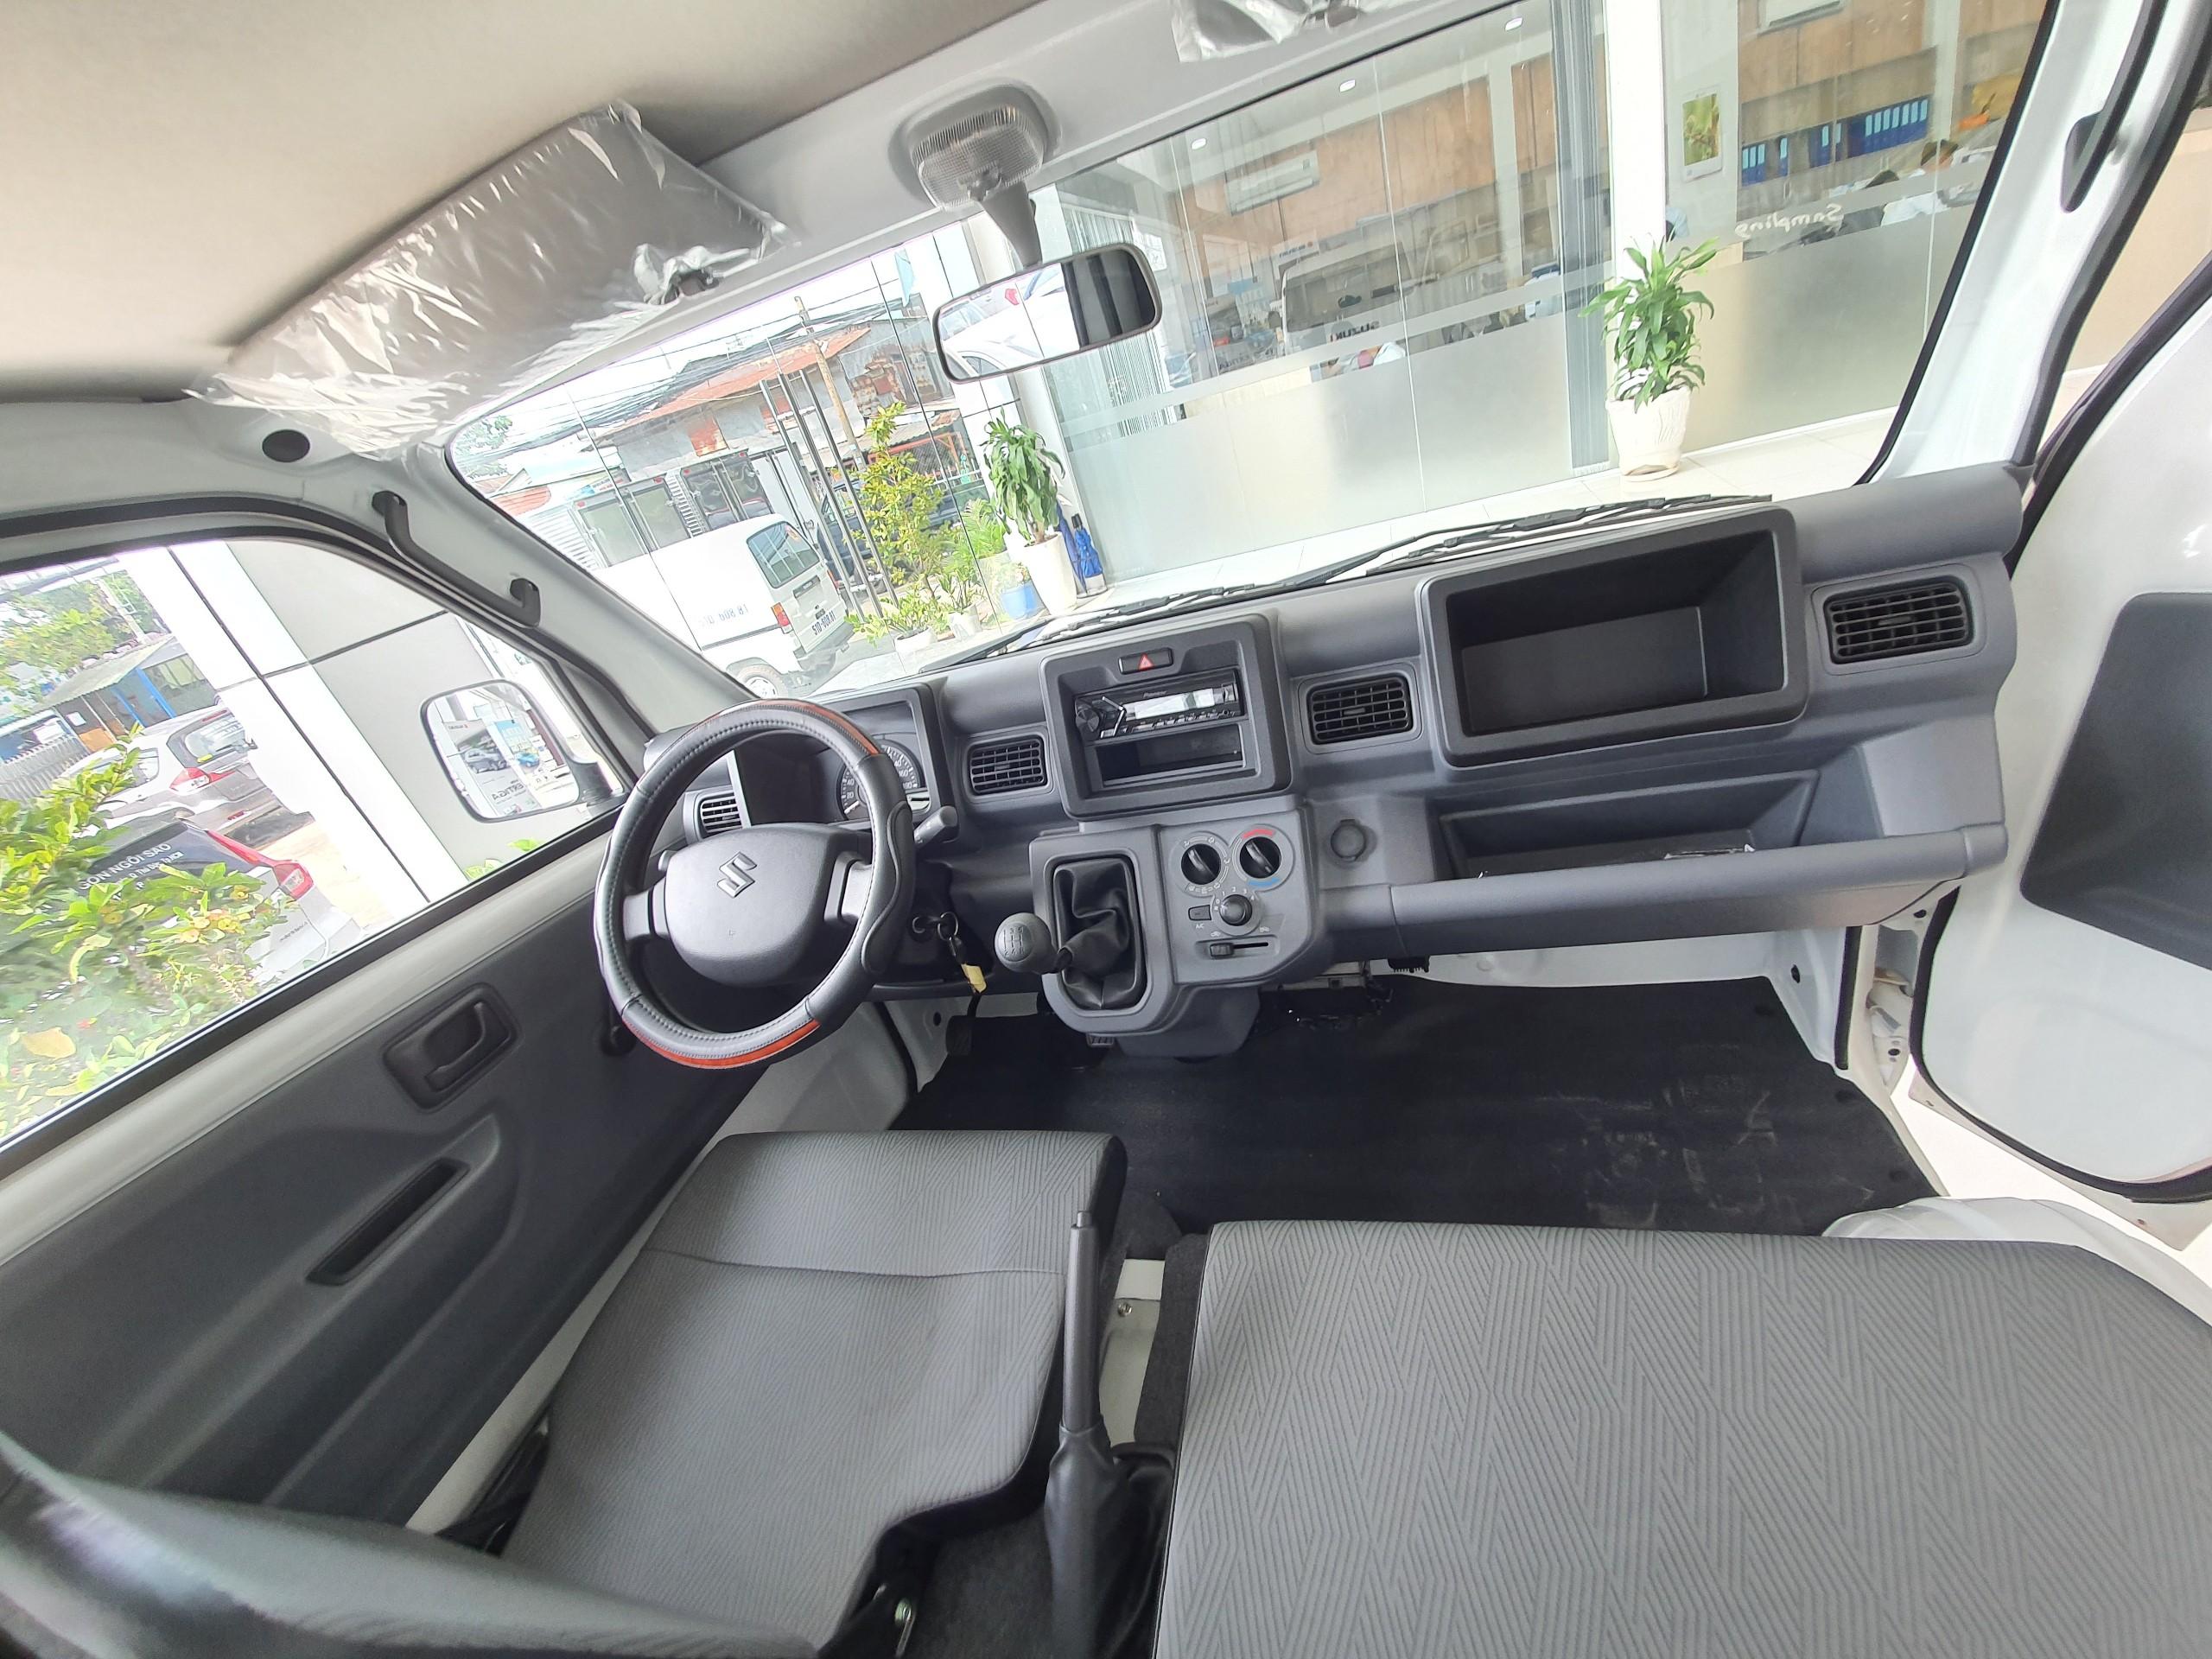 xe tải suzuki carry pro mới 2019 1